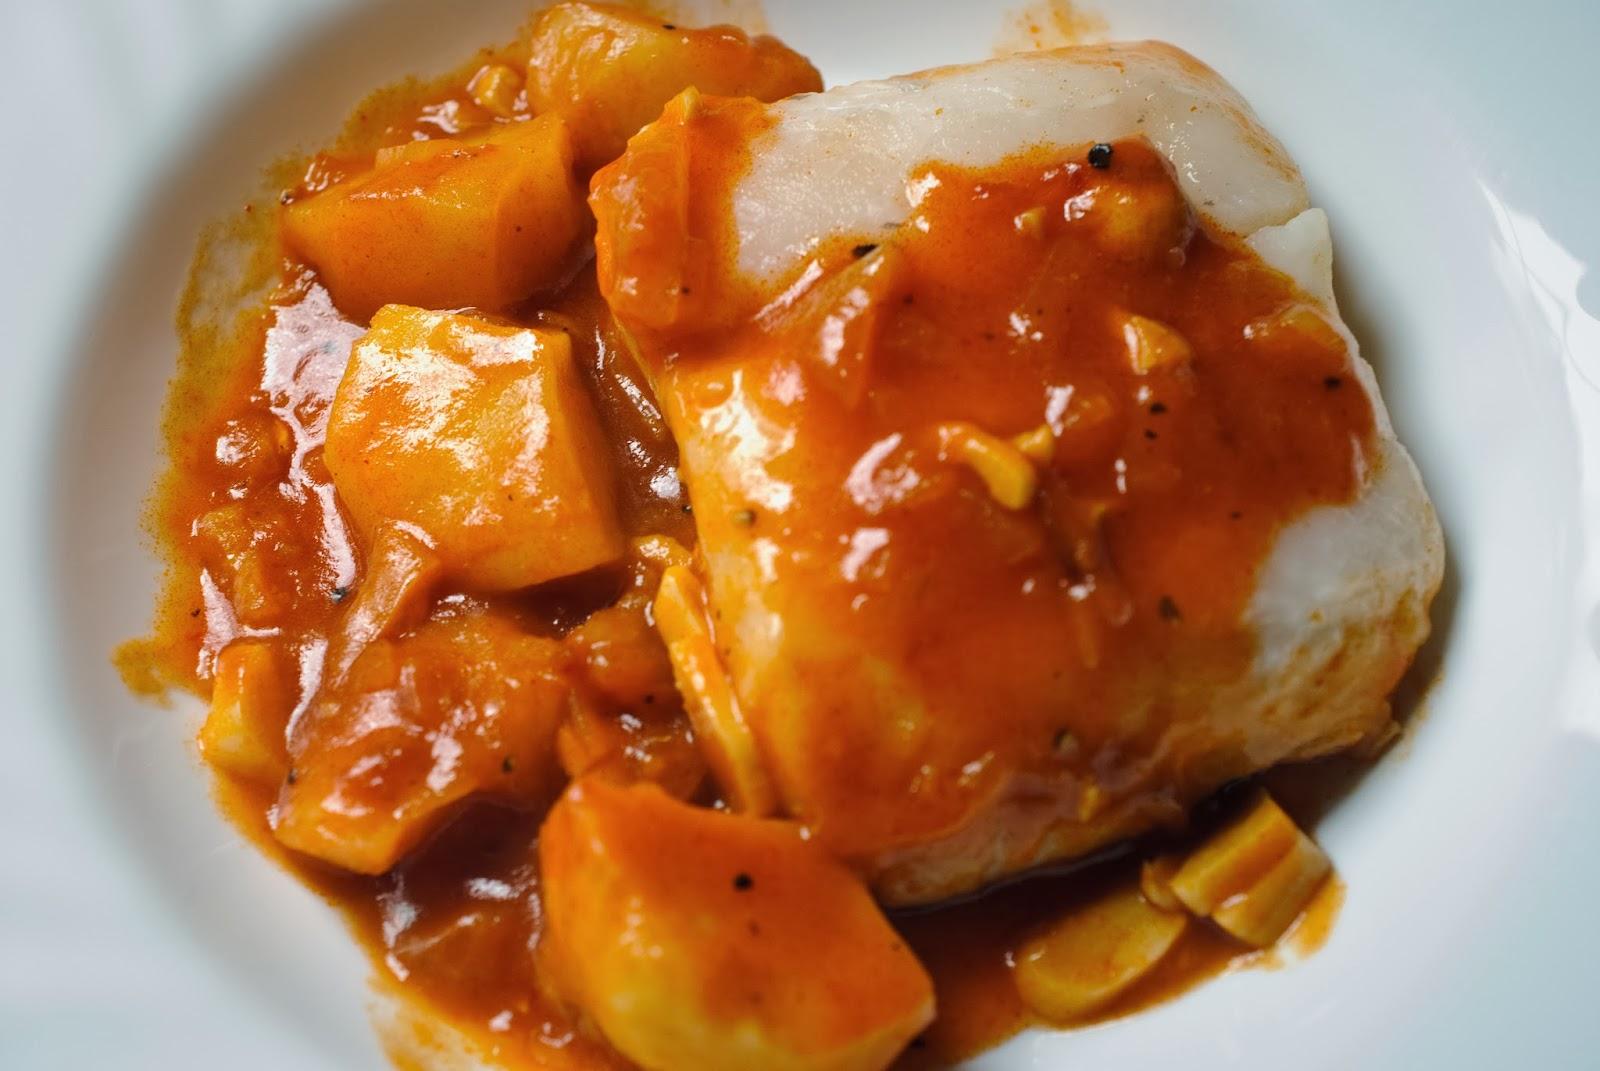 merluza con tomate; hake with tomato sauce